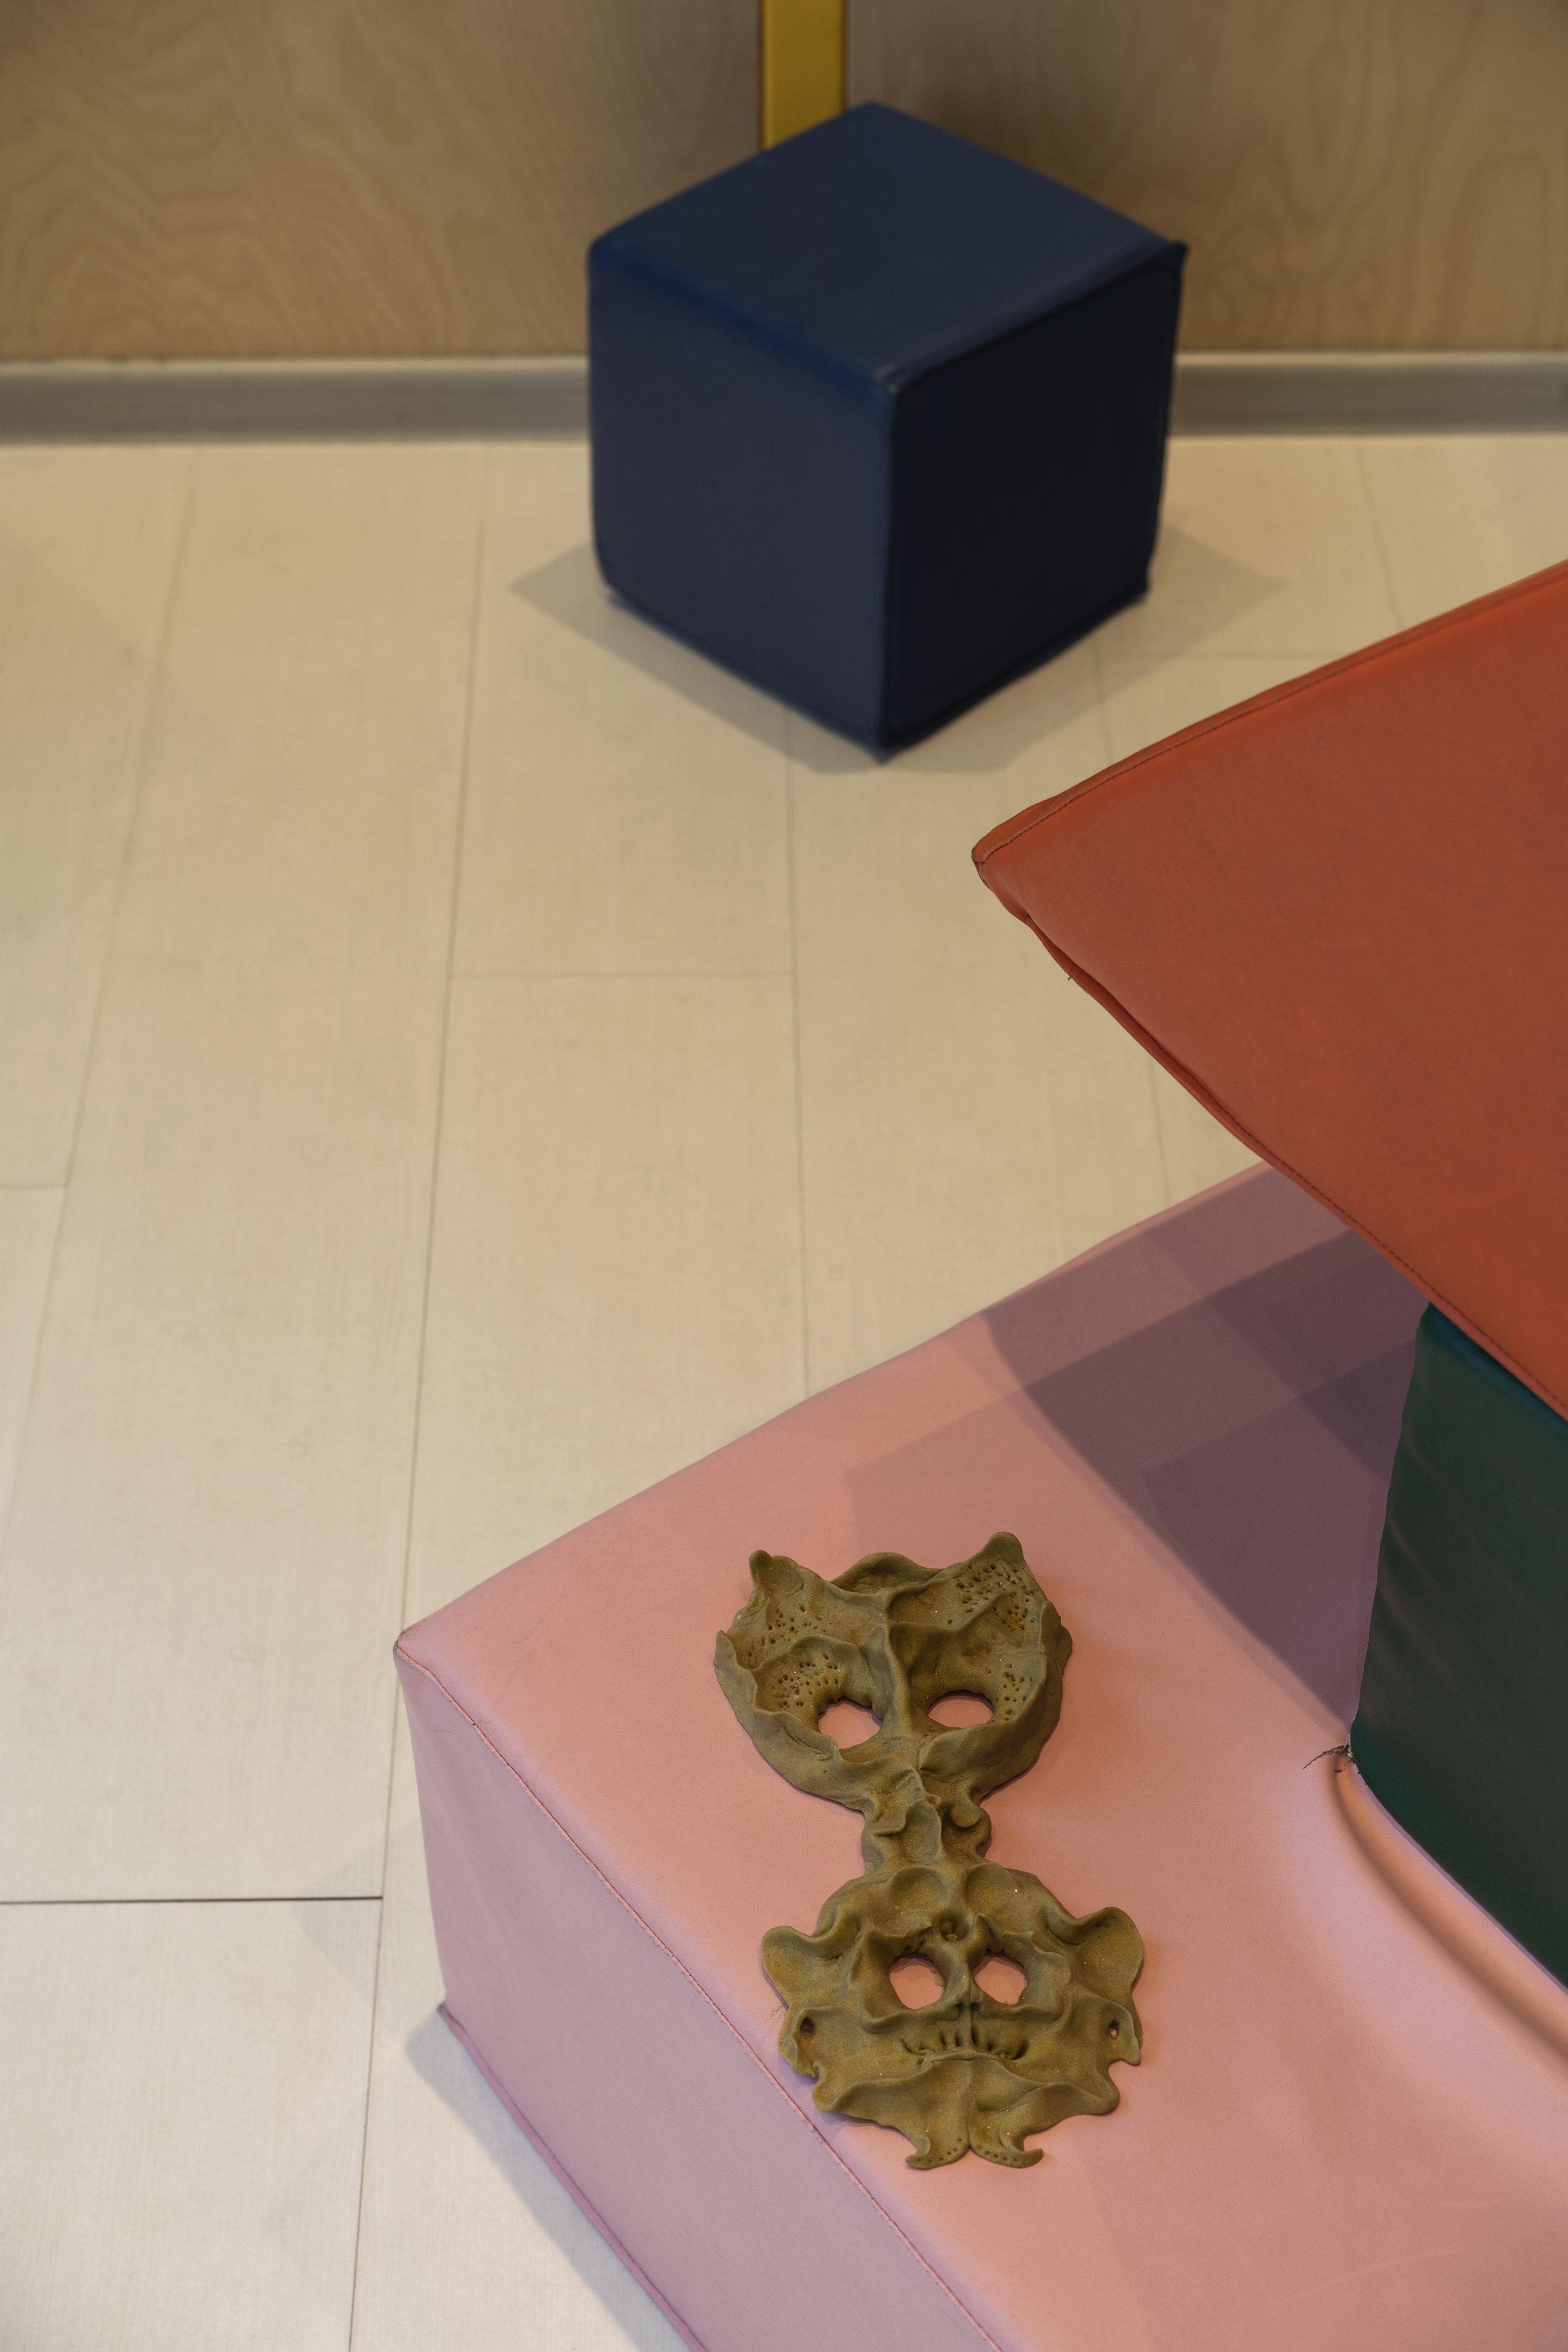 Visitor (O) by Pasha Bezor and Pasha Blagoveshchensky, 2019